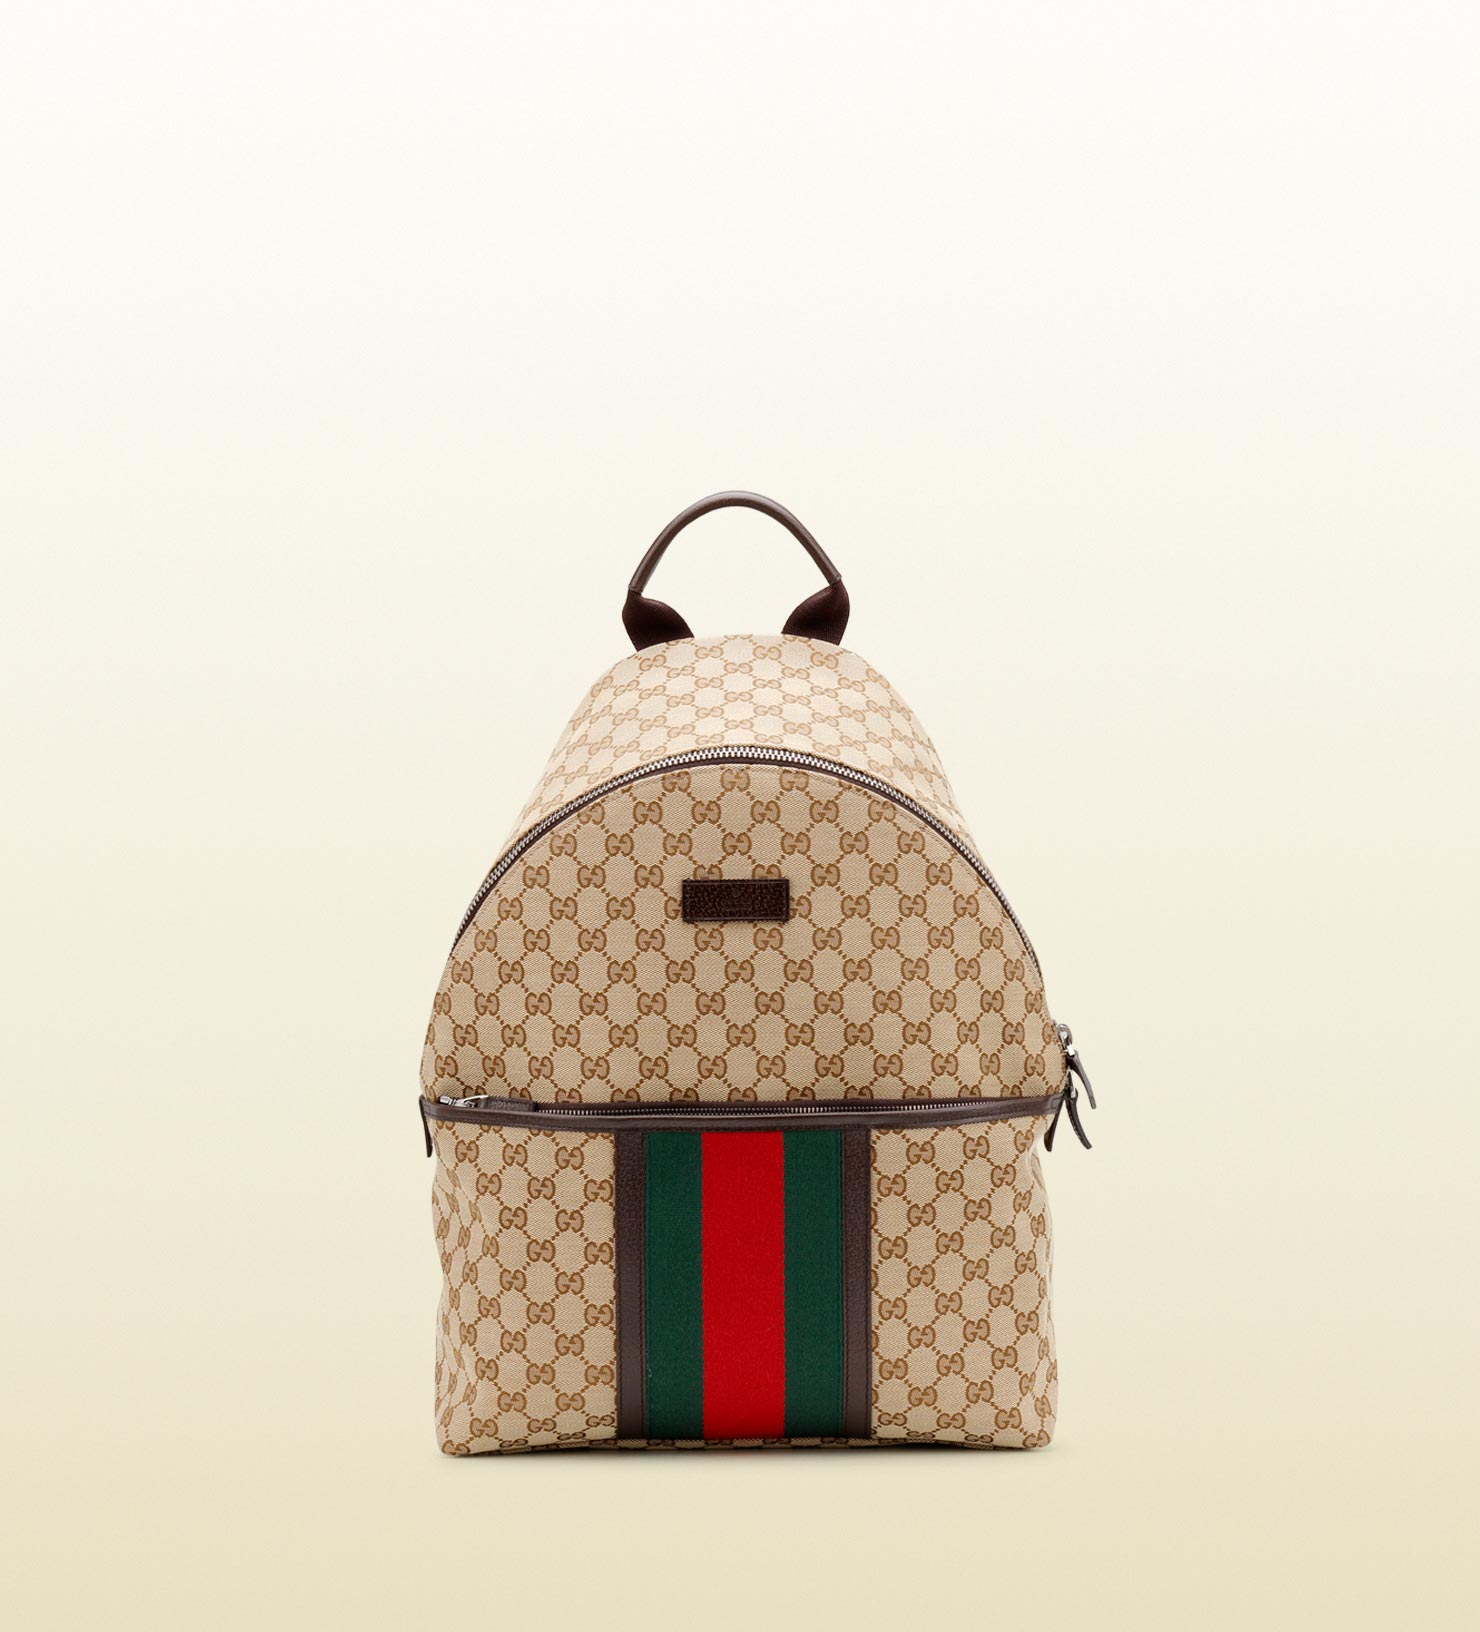 084b894791ec Lyst - Gucci Original Gg Canvas Backpack in Natural for Men